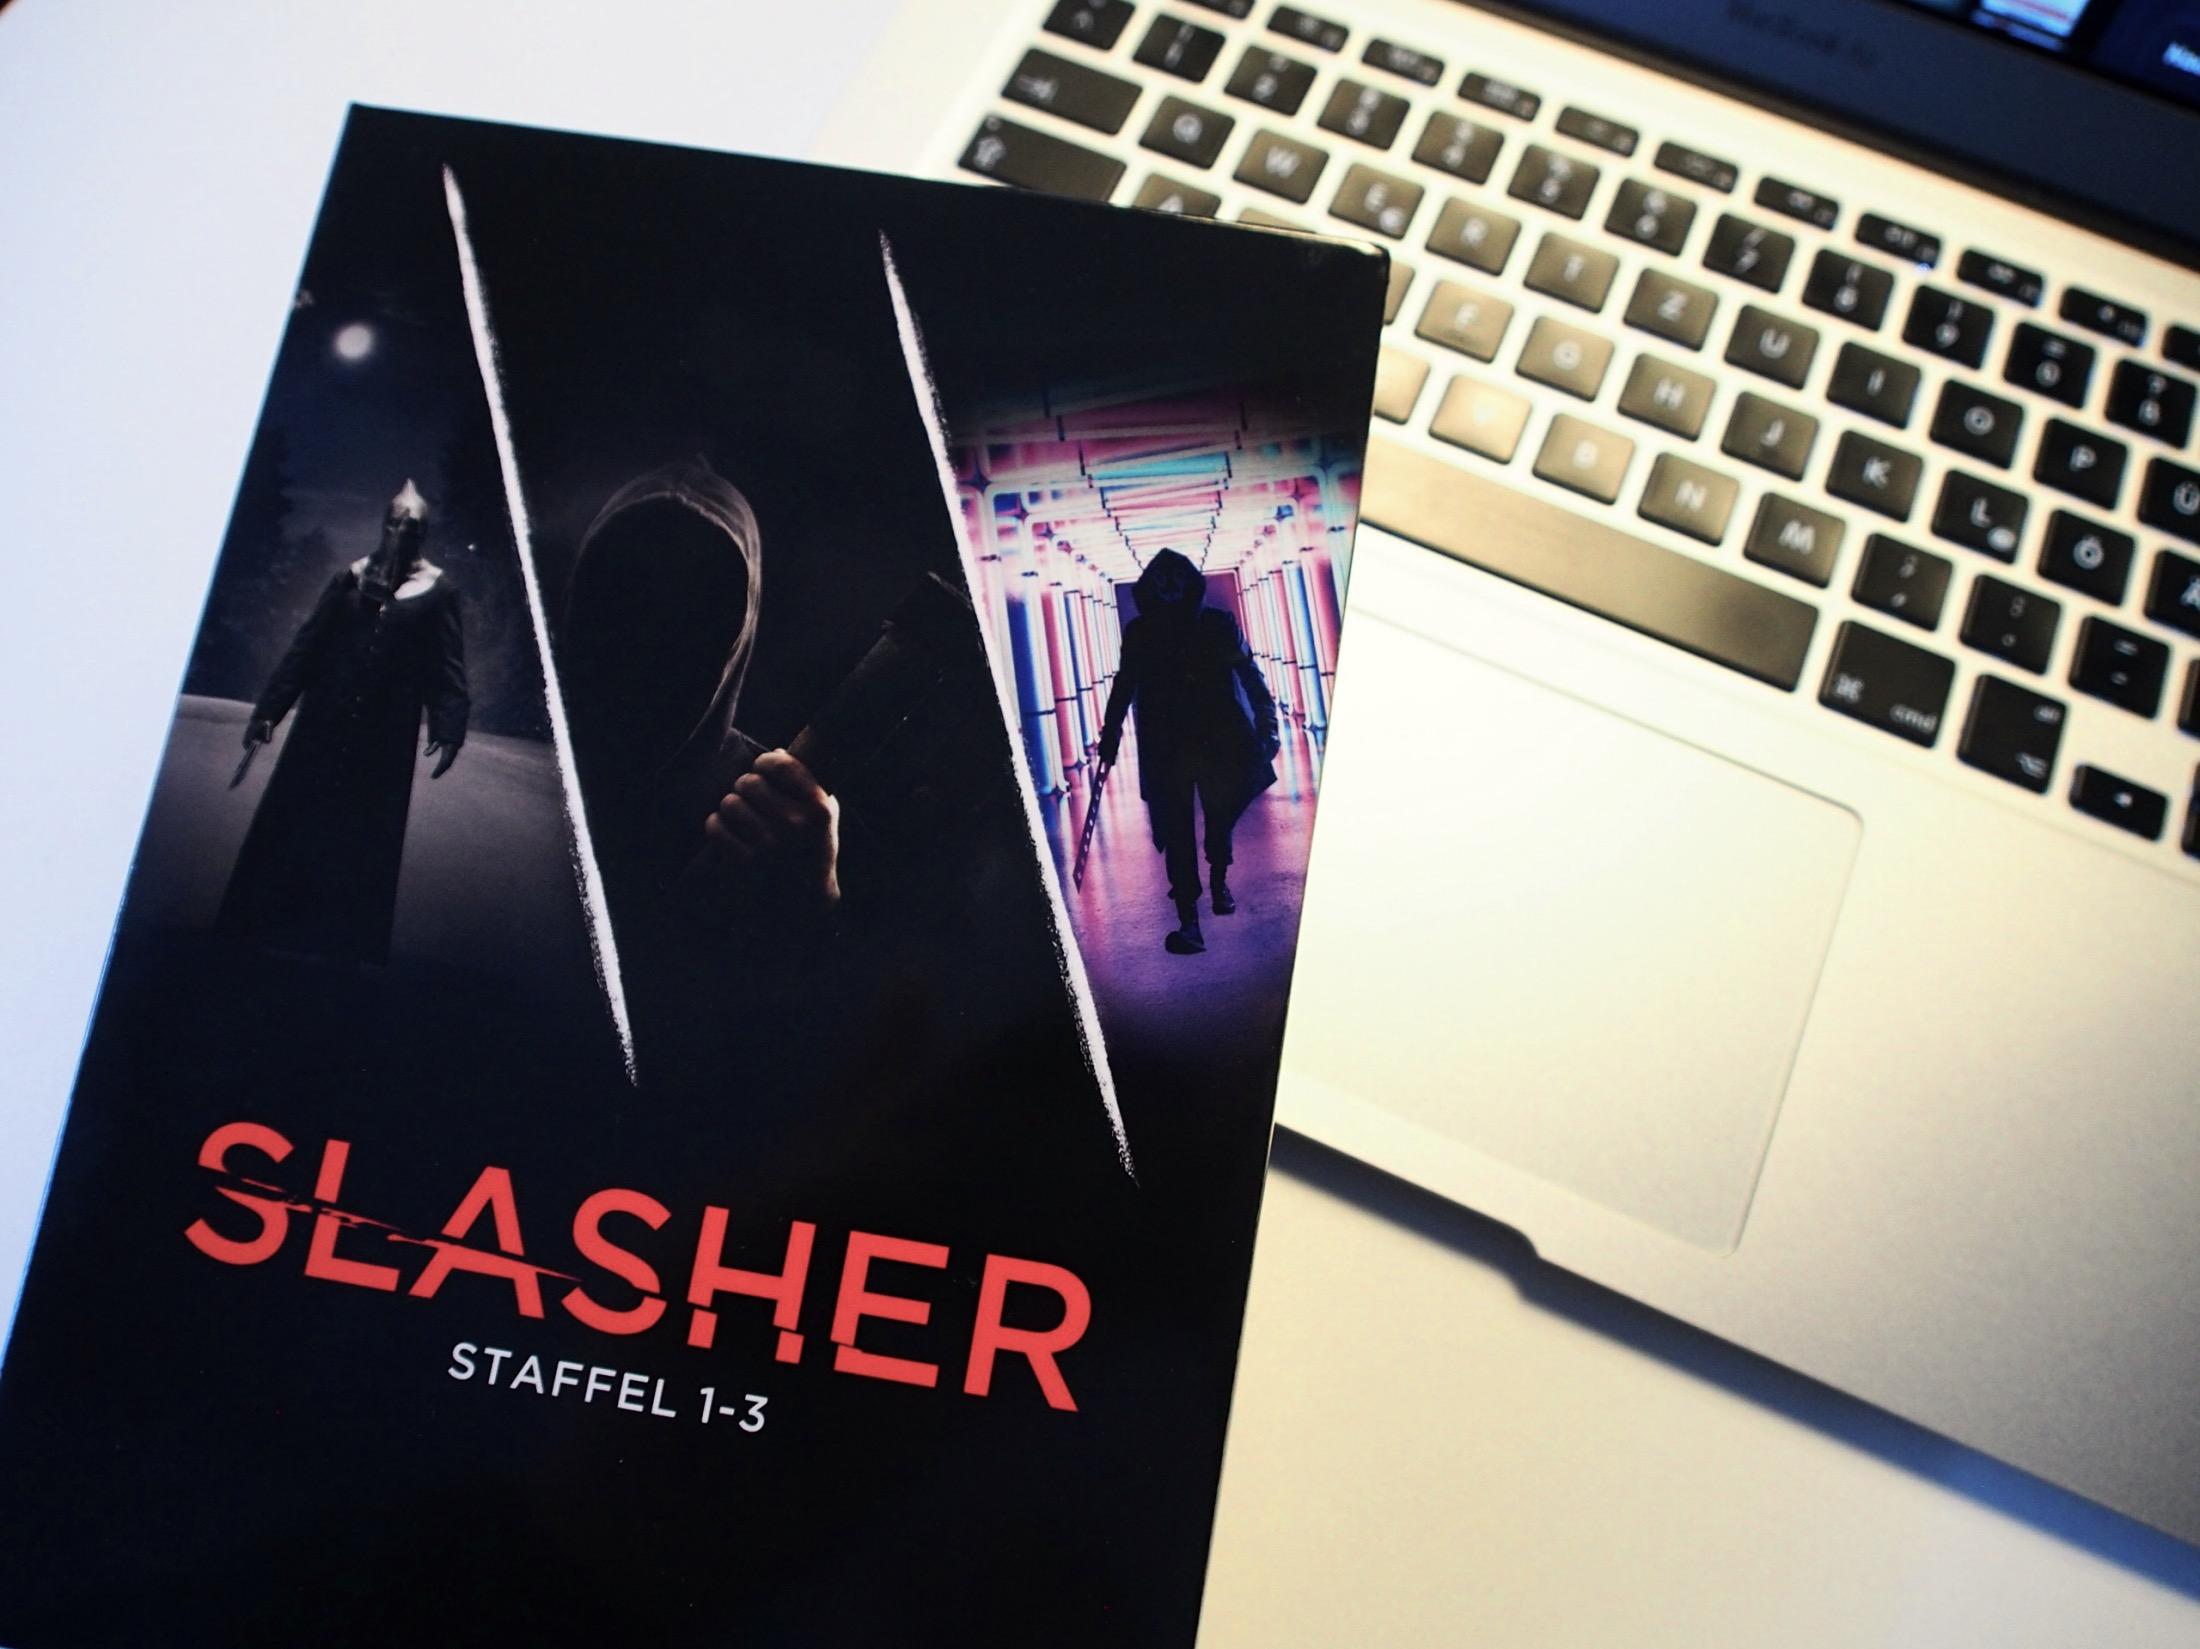 Reingeschaut: Slasher